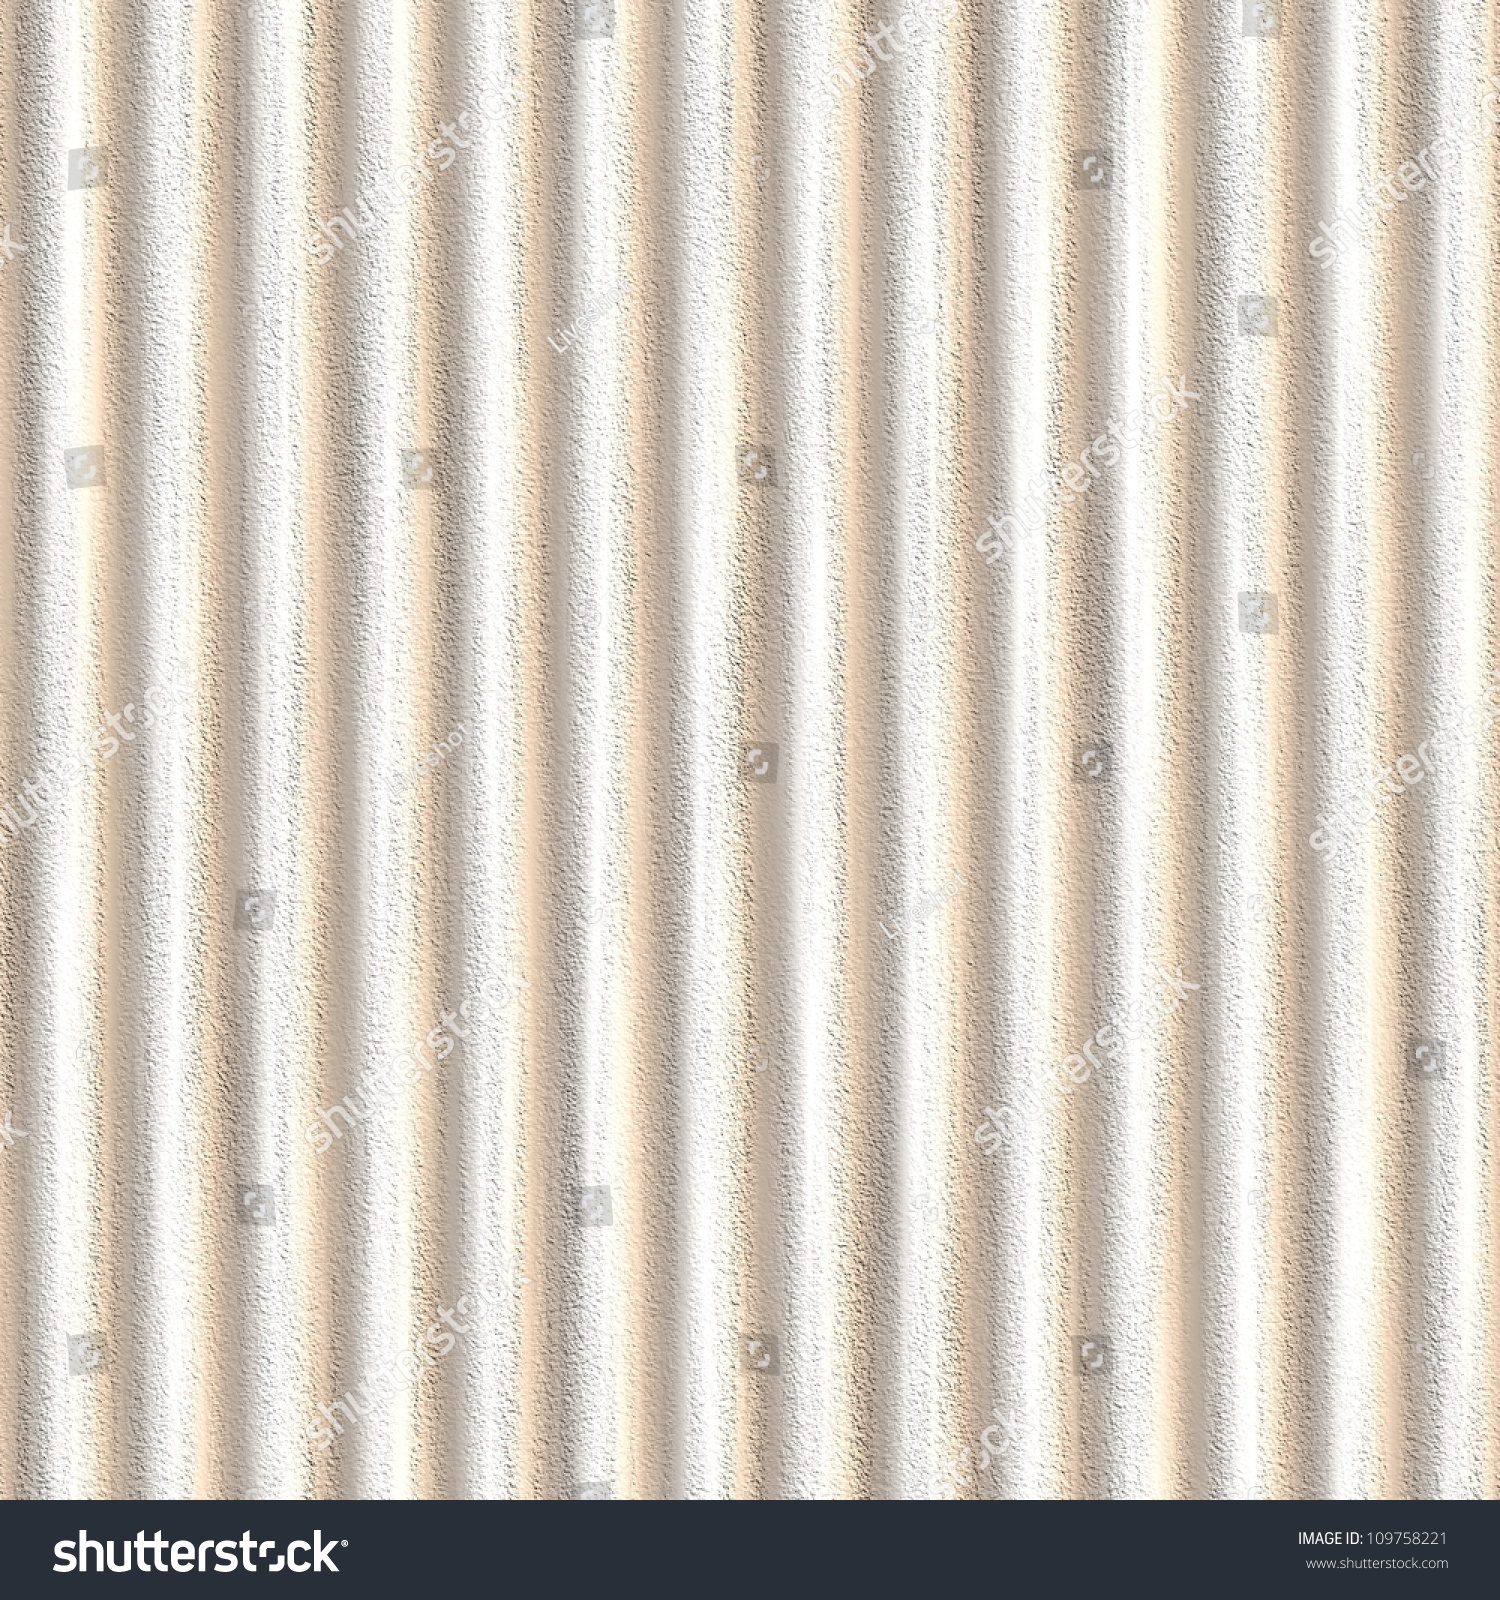 Corrugated Metal Seamless texture  Corrugated Metal Seamless Texture Stock  Illustration 109758221. Corrugated Metal Seamless Texture